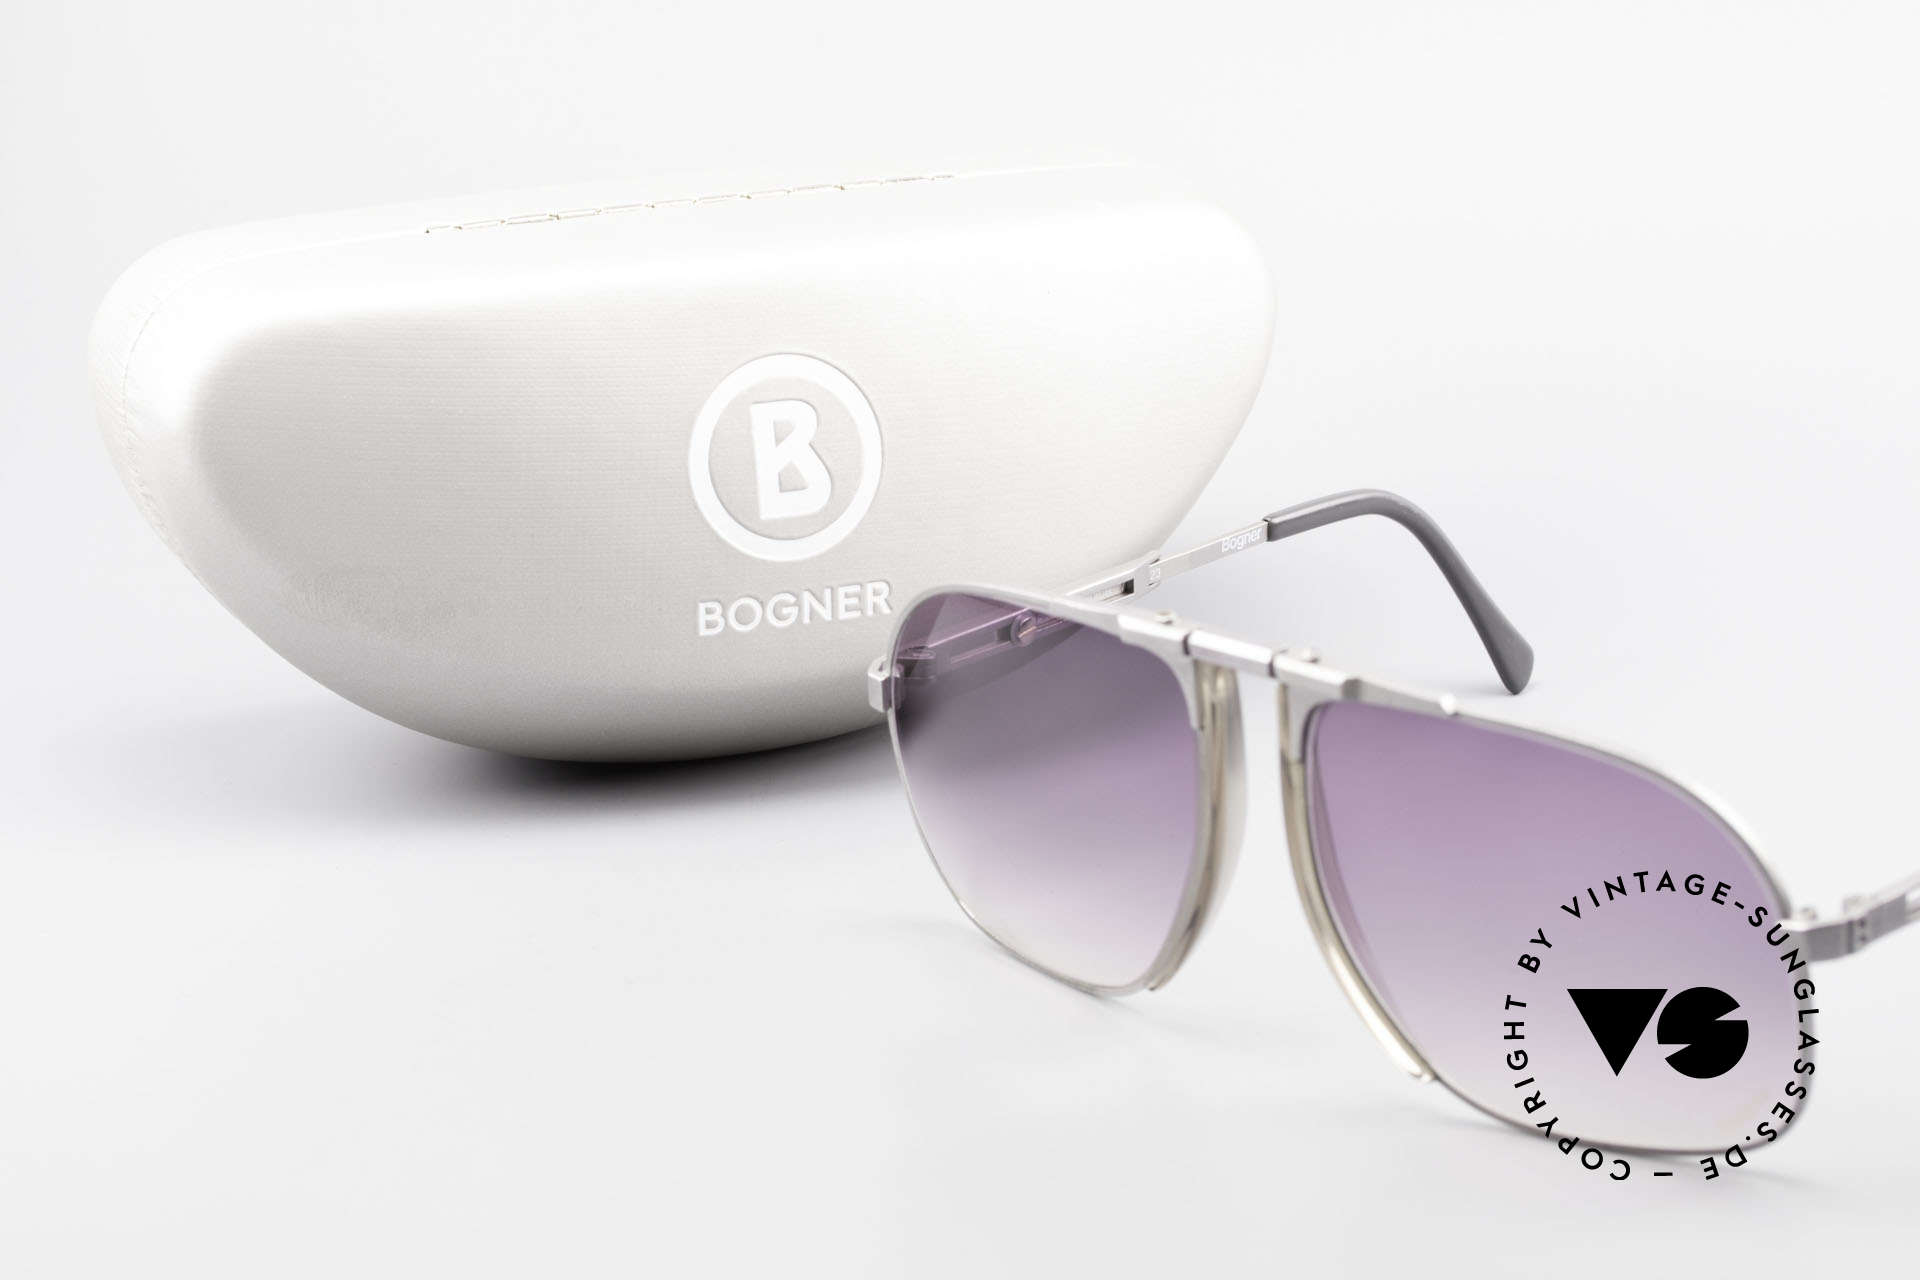 Willy Bogner 7023 Adjustable Sunglasses 80's, Size: large, Made for Men